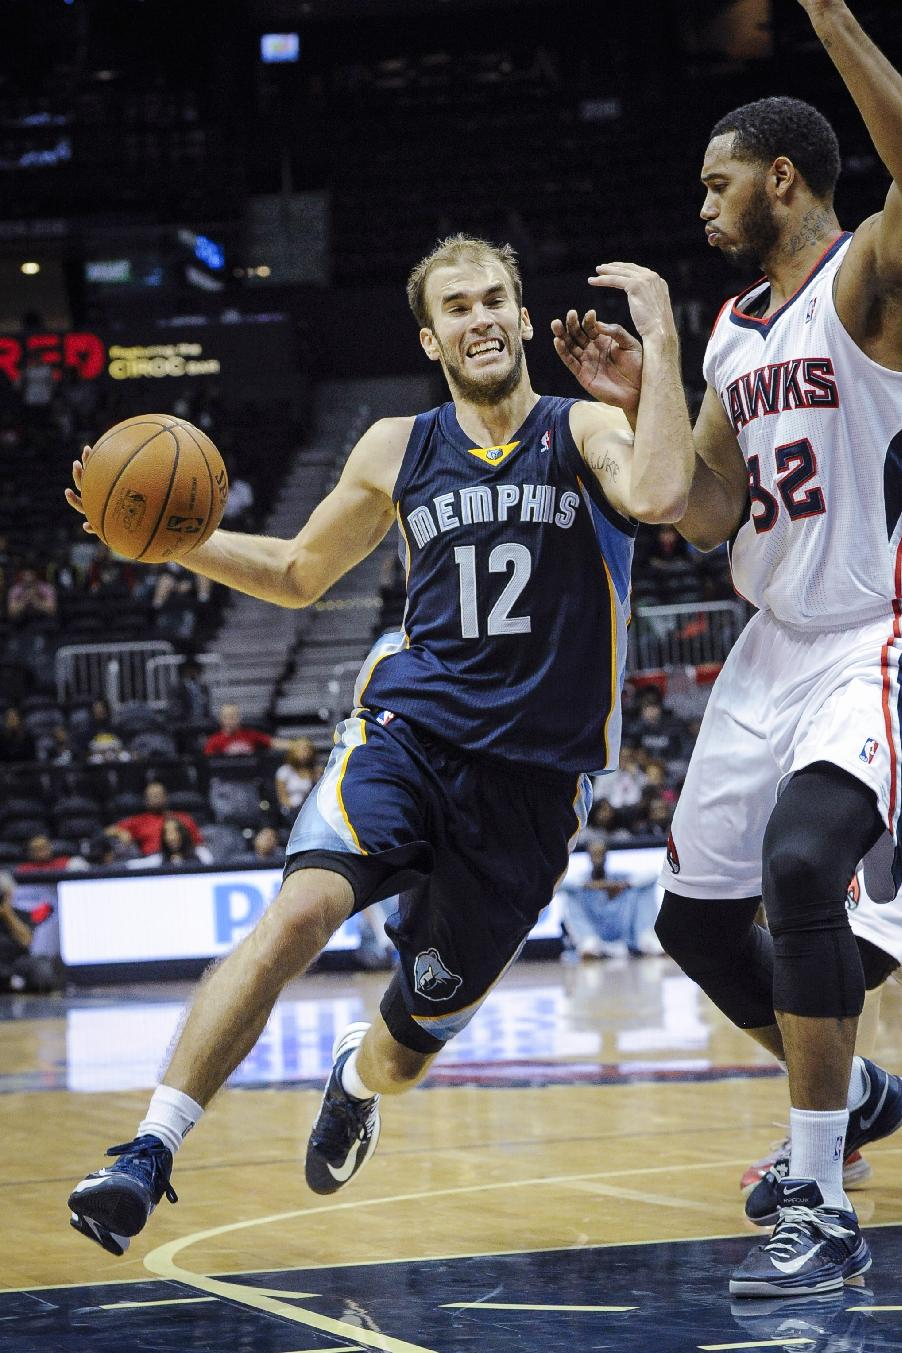 Memphis Grizzlies' Nick Calathes (12) drives against the defense of Atlanta Hawks forward Mike Scott (32) during the second half of an NBA preseason basketball game, Sunday, Oct. 20, 2013, in Atlanta